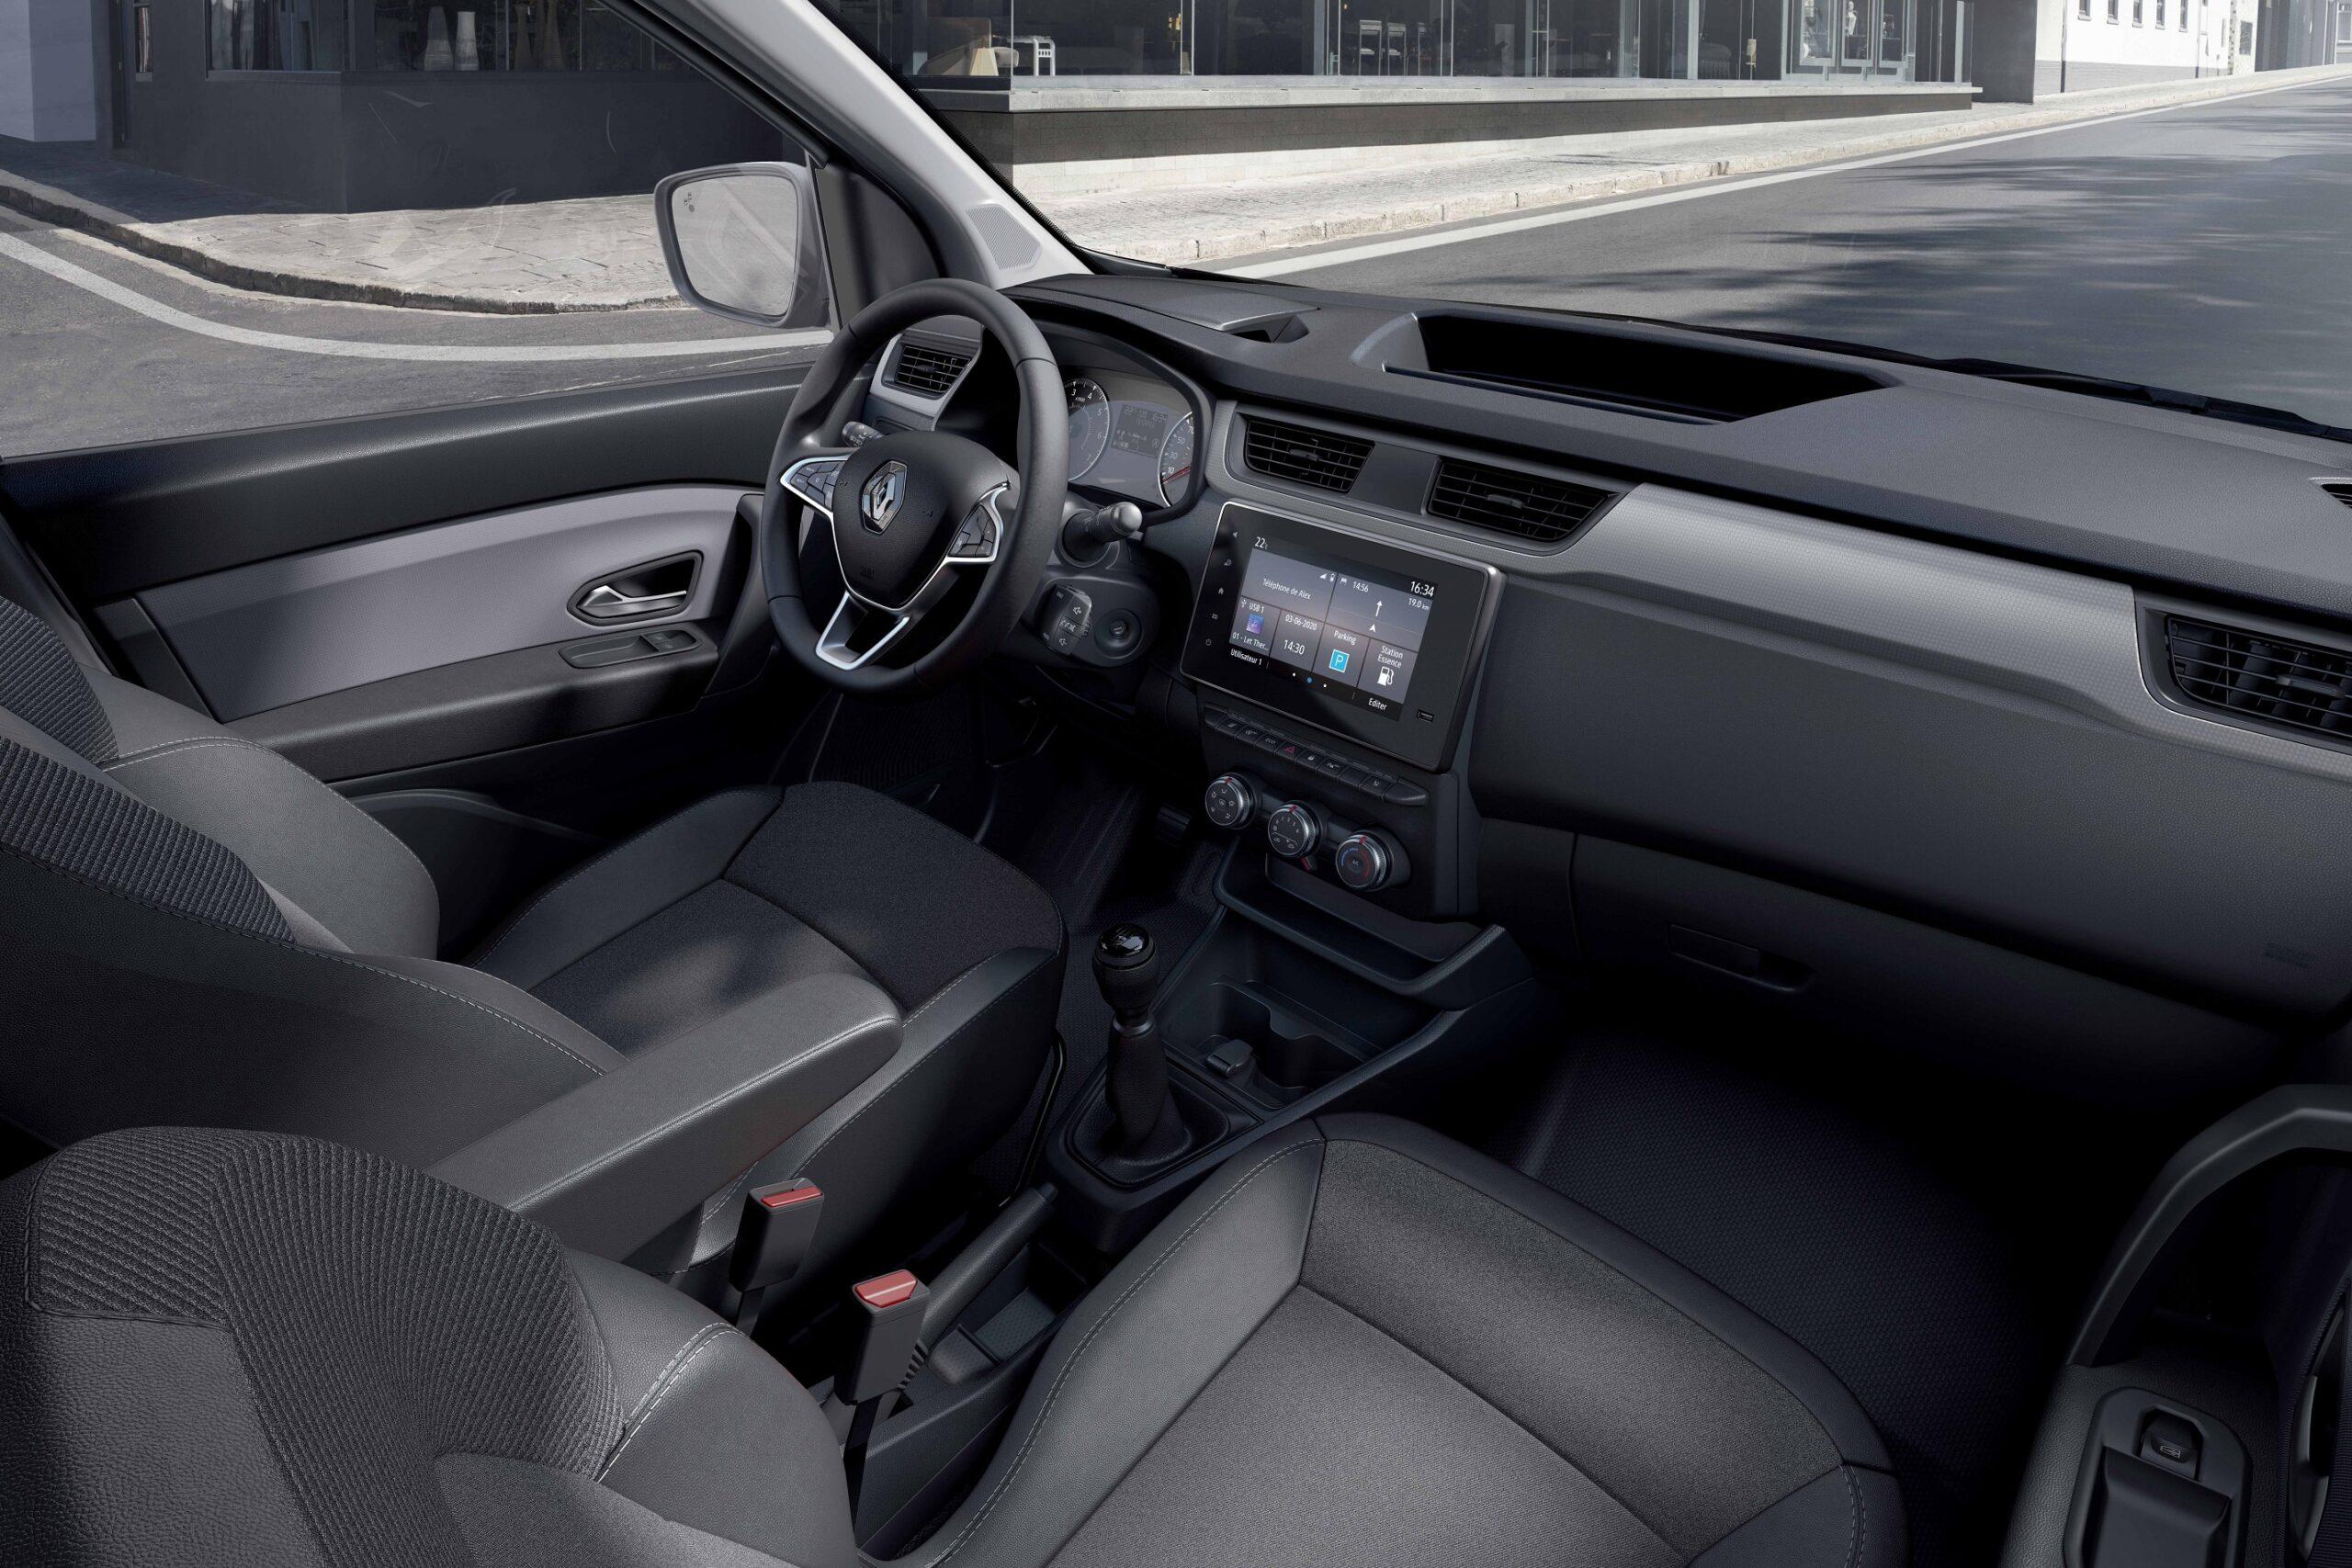 Renault Express interior